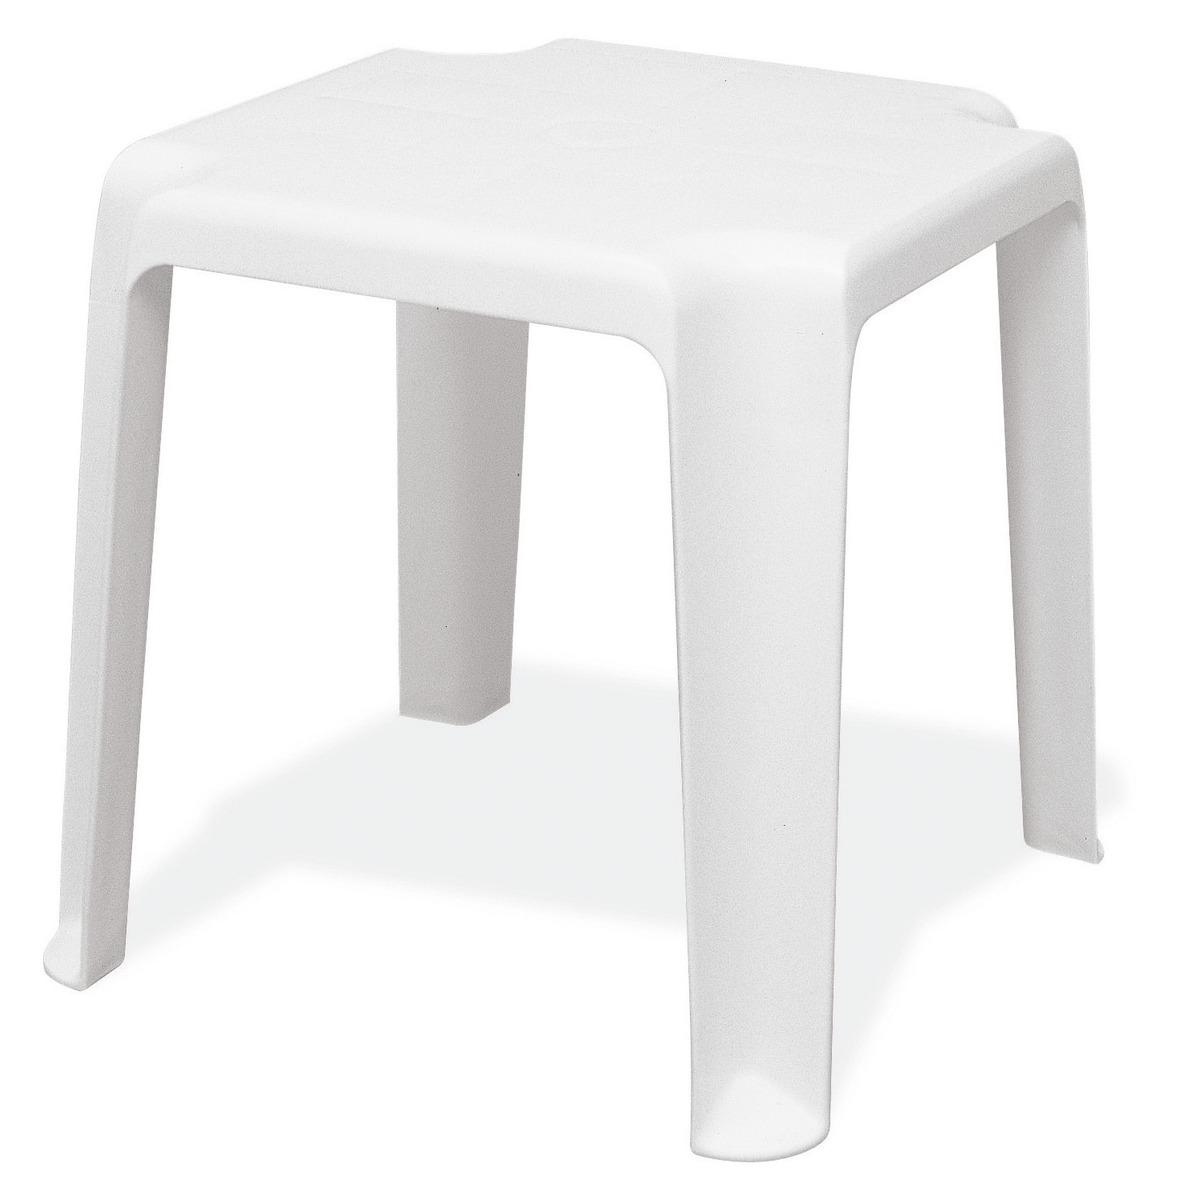 Mesa de Plastico Apoio Pituba Branca - Tramontina